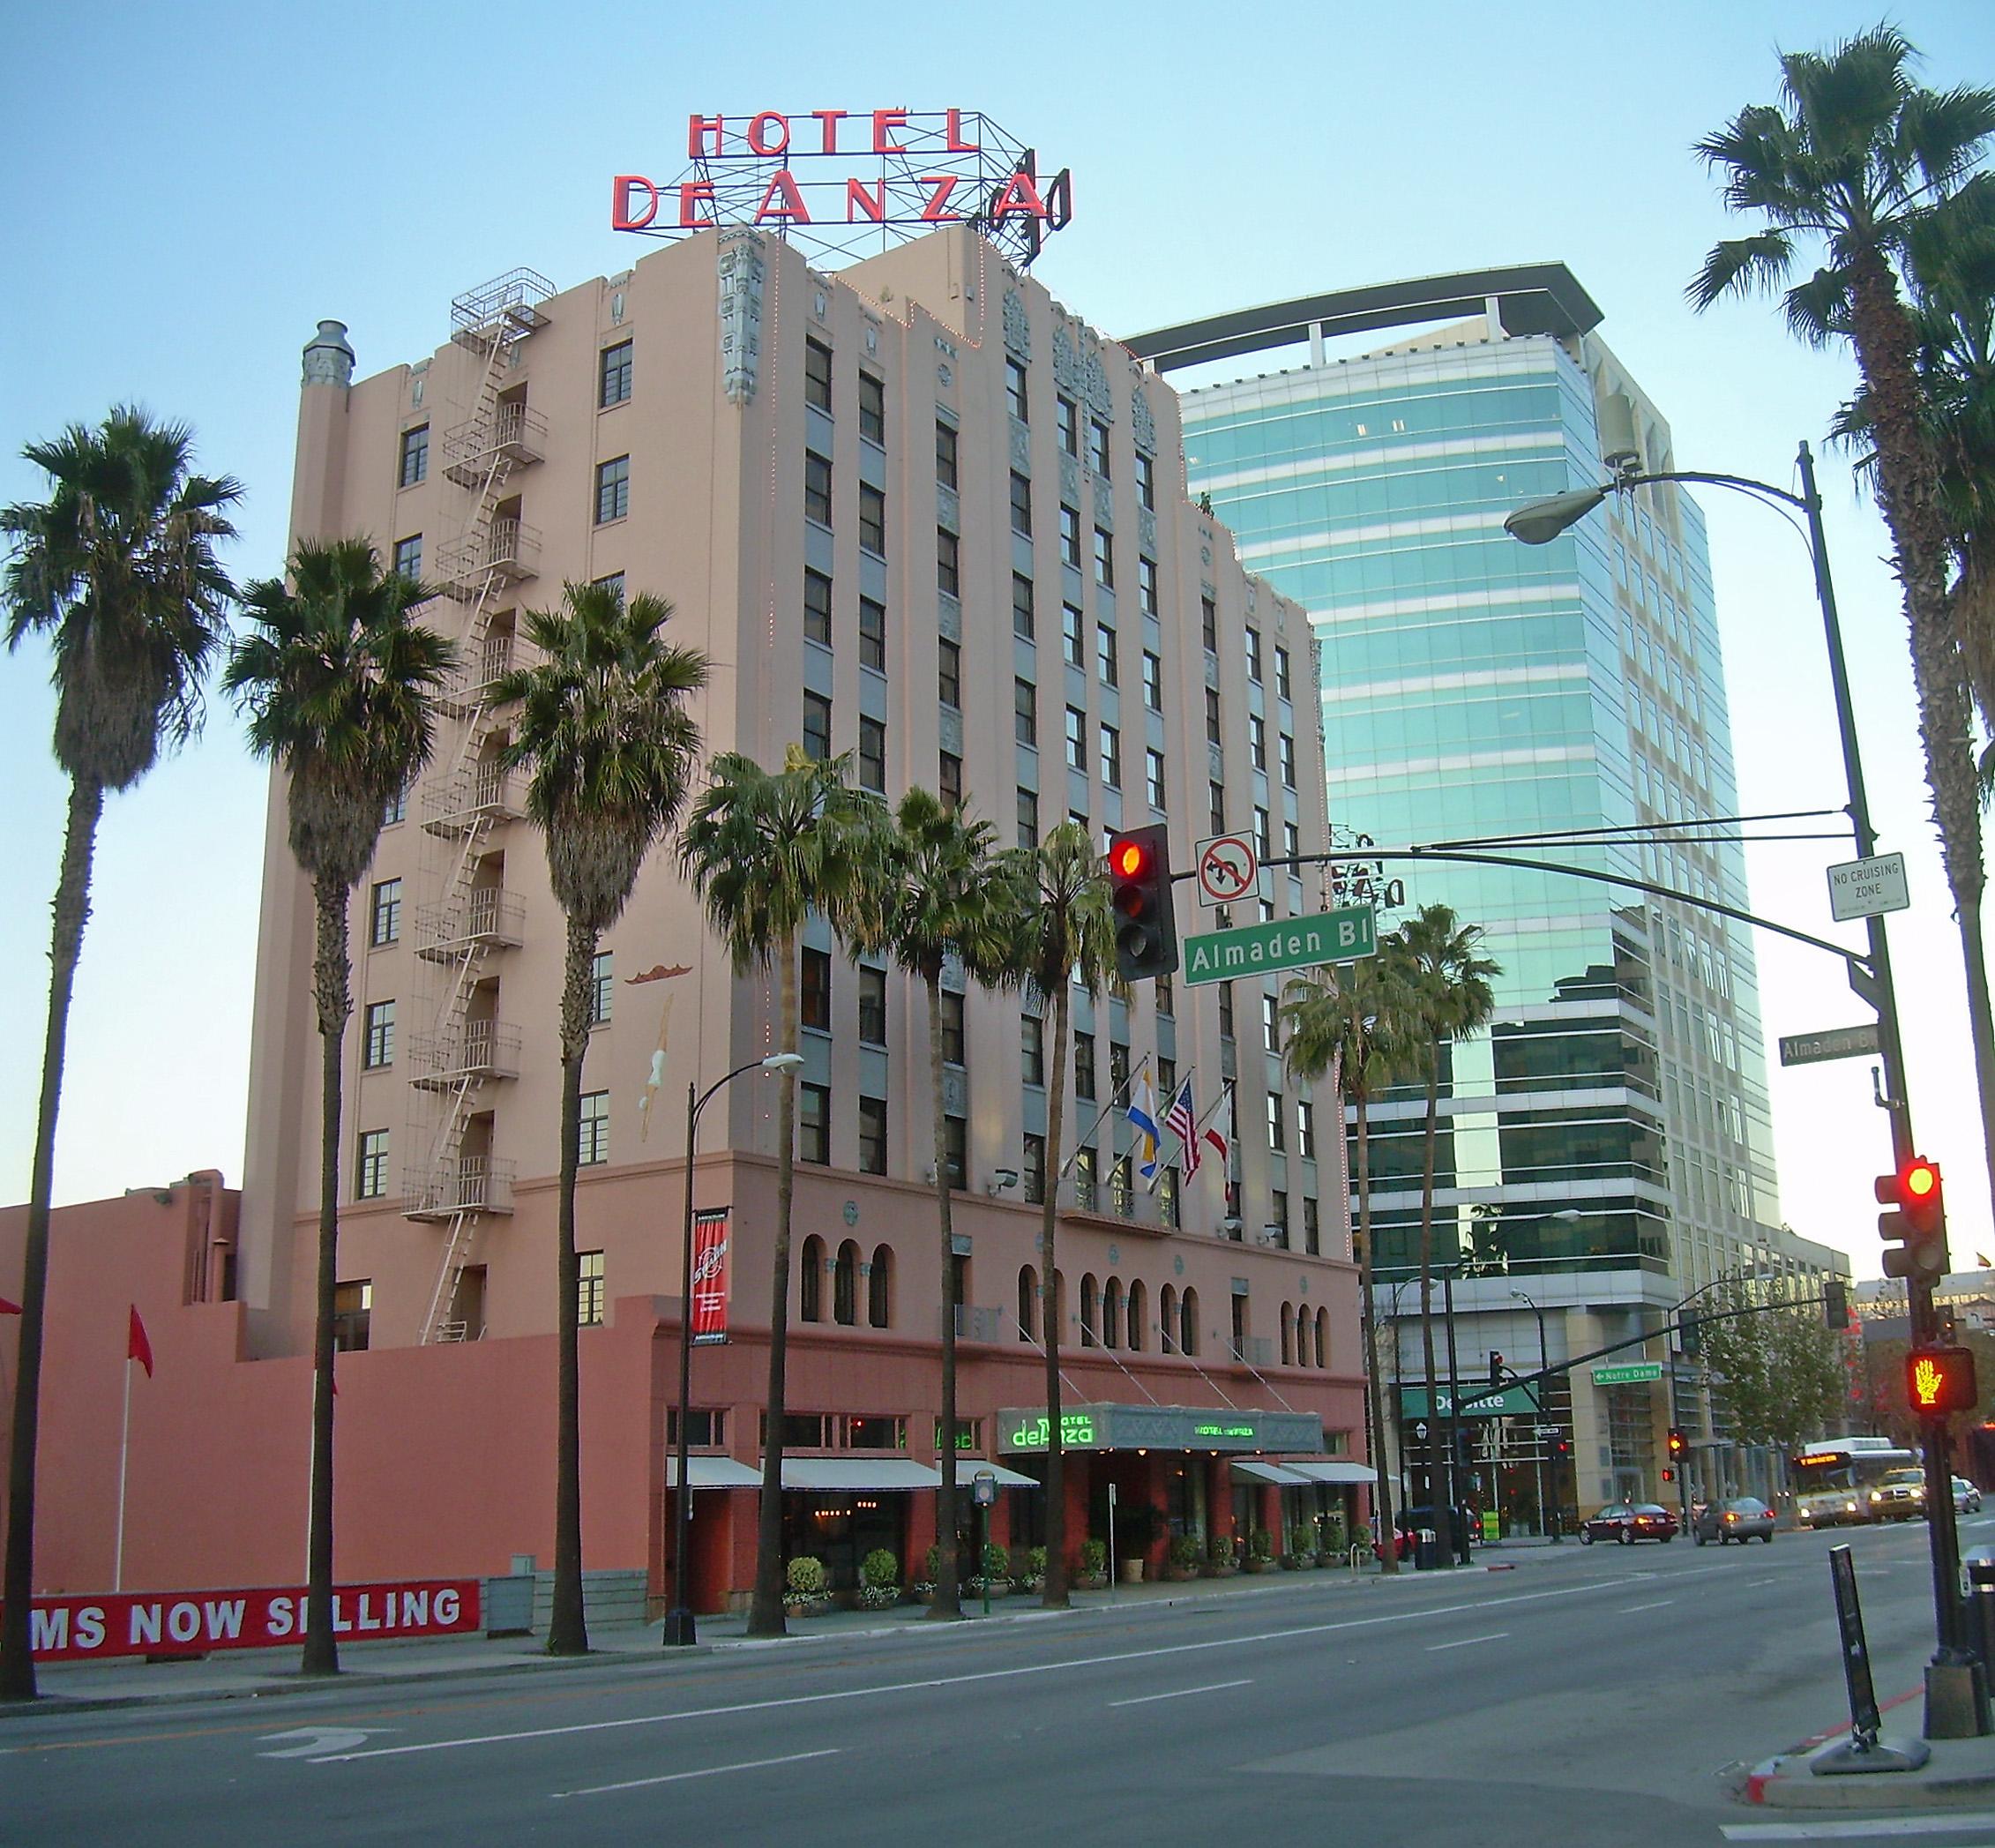 Hotel De Anza San Jose